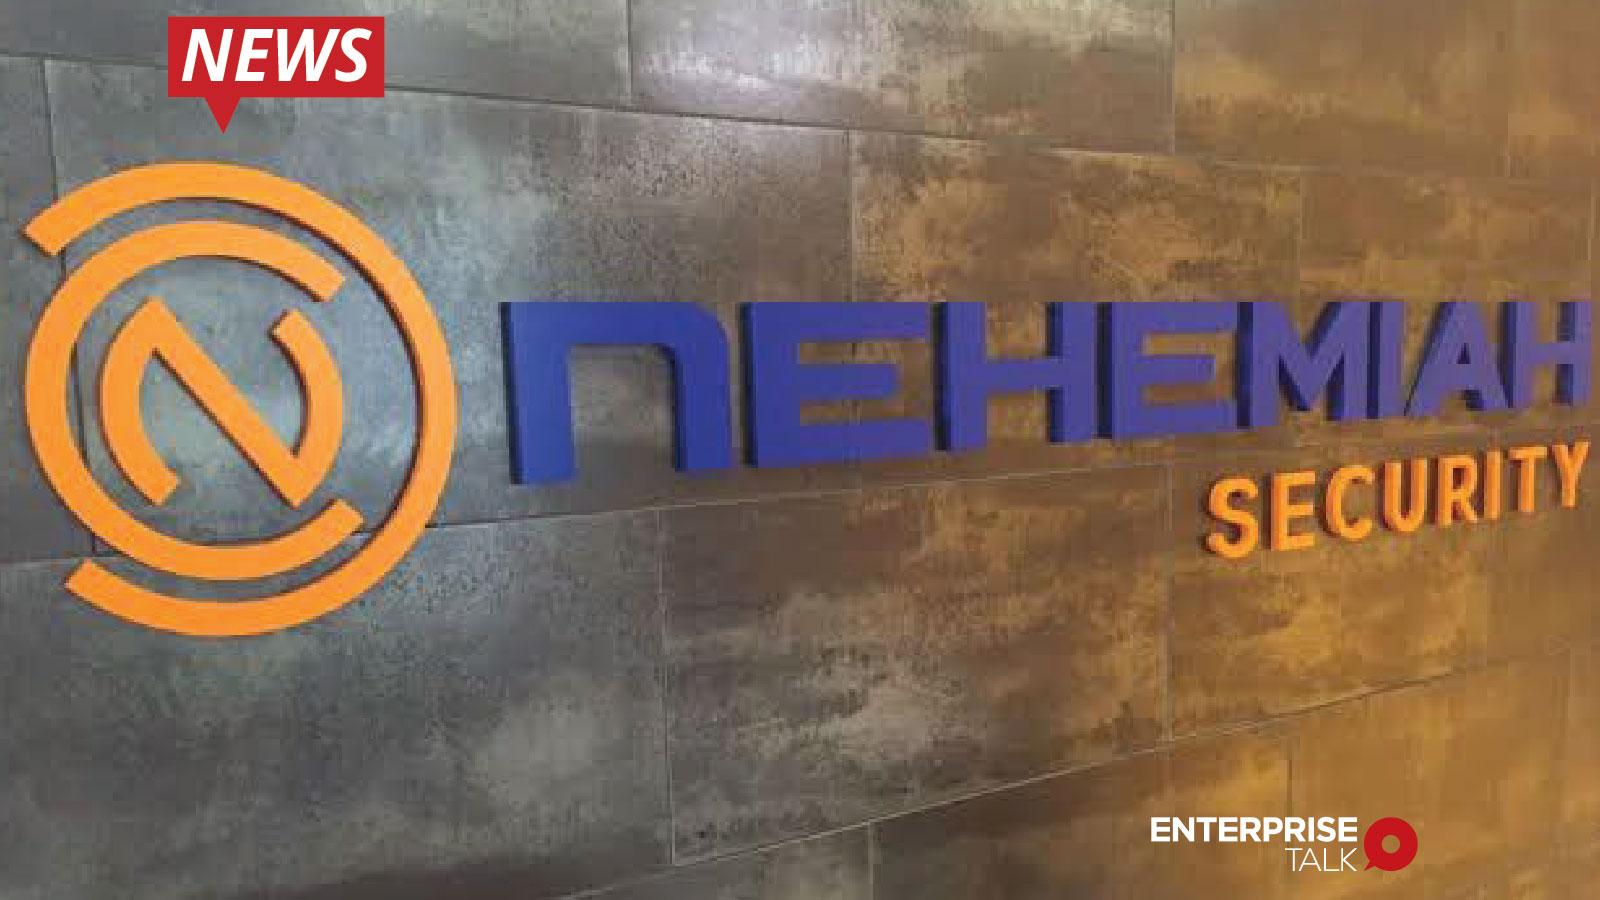 Nehemiah Security, Risk Quantifier 3.4, SaaS solution, Risk Quantifier, Cyber risk, Cybersecurity, NIST, MITRE ATT&CK